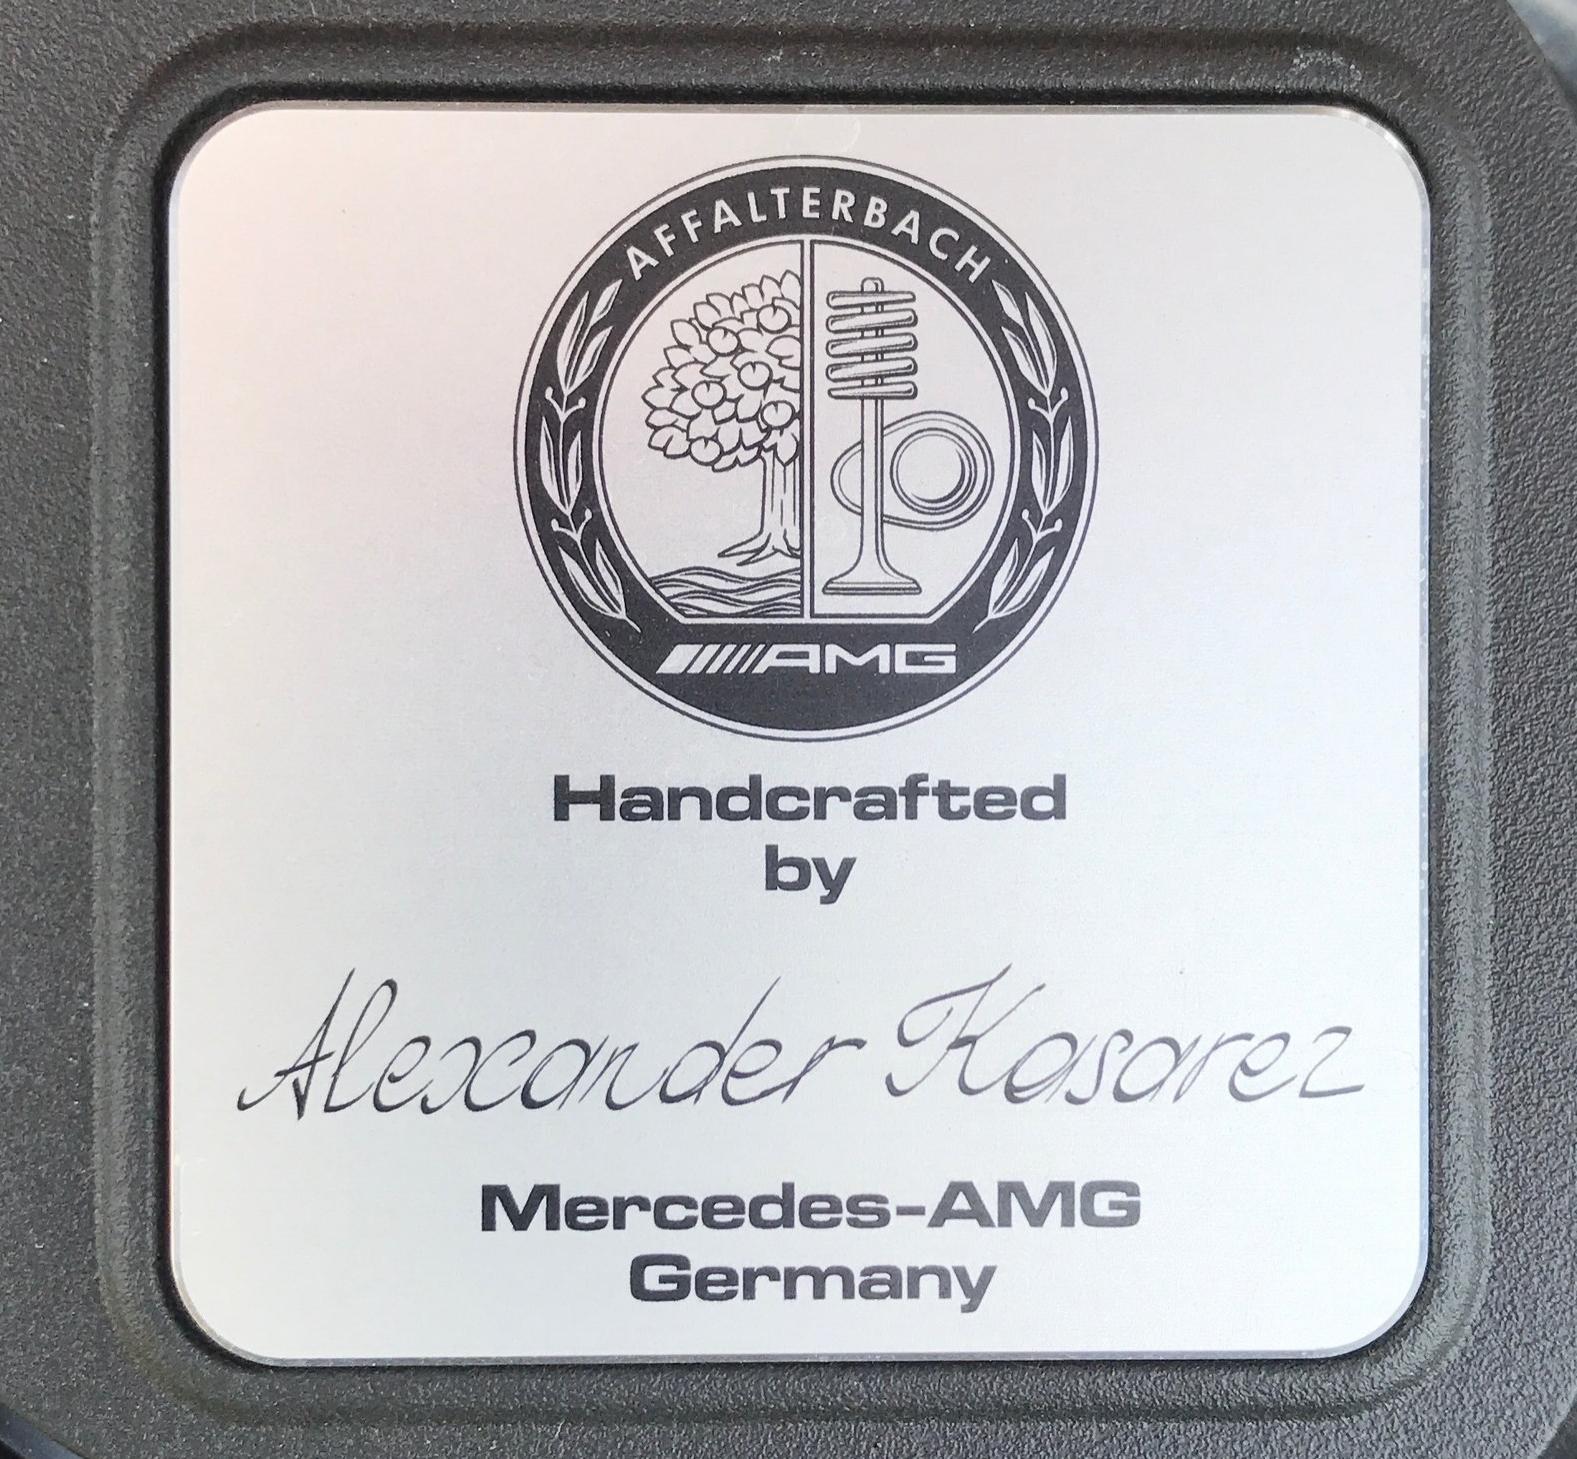 One man, one motor: AMG.